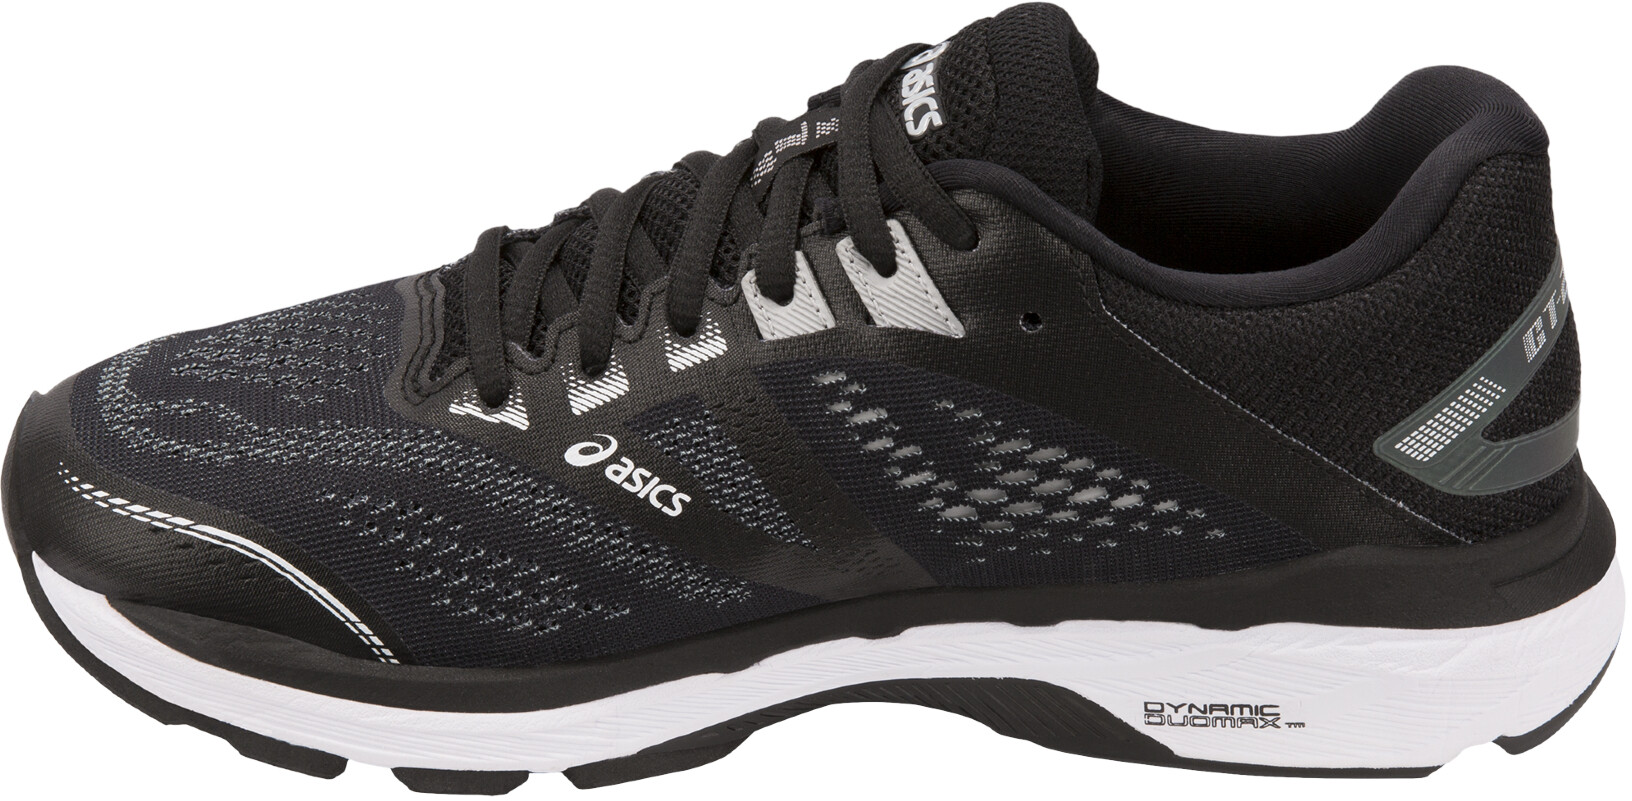 83cab80a6d0 asics GT-2000 7 Shoes Women, black/white I Eenvoudig online bij Bikester